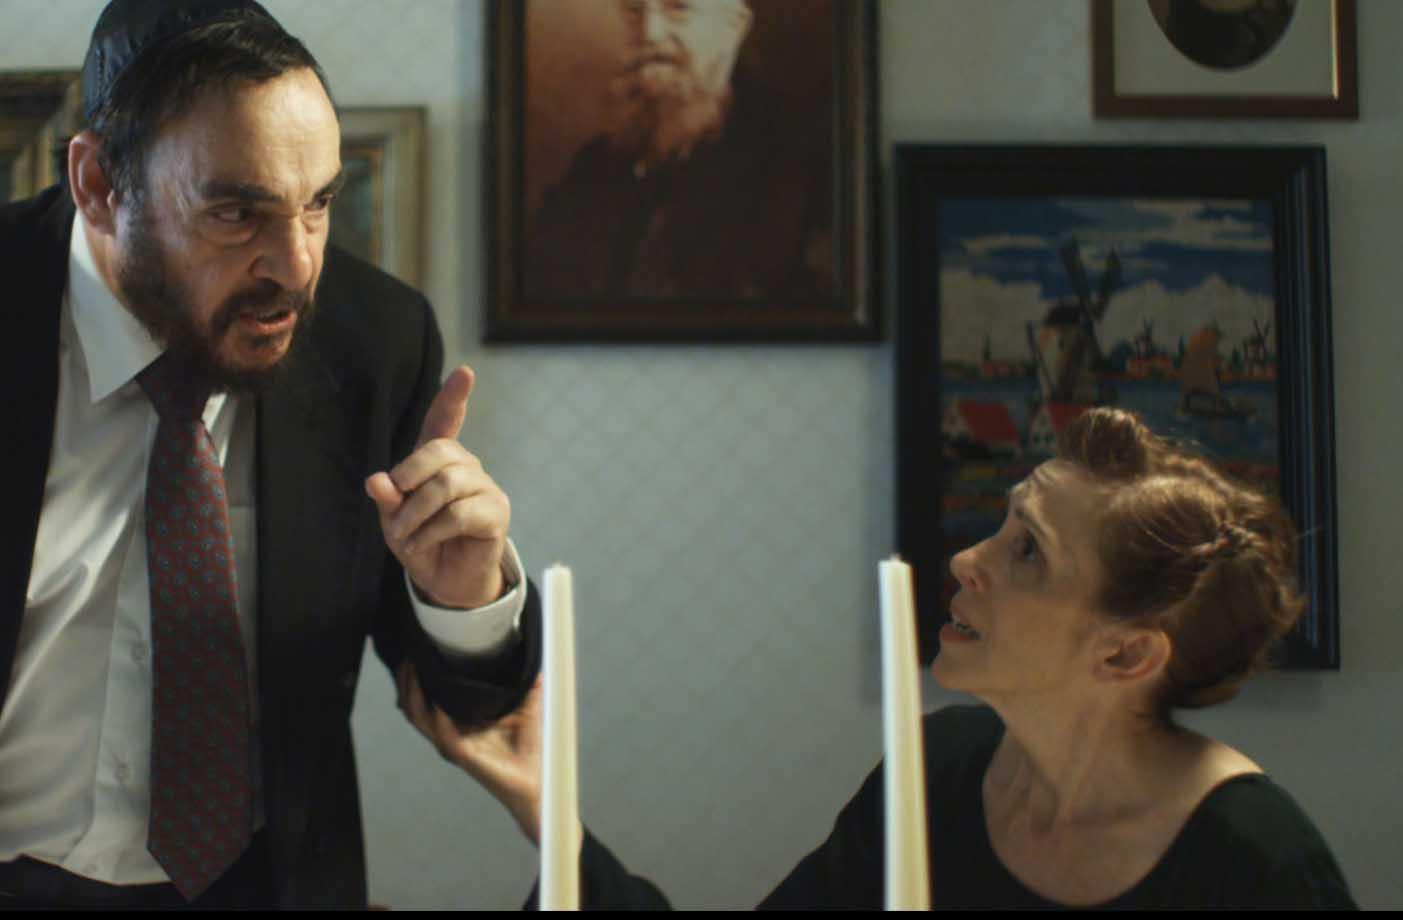 Return to the Hiding Place stars Emmy-nominated John Rhys-Davies & Mimi Sagadin